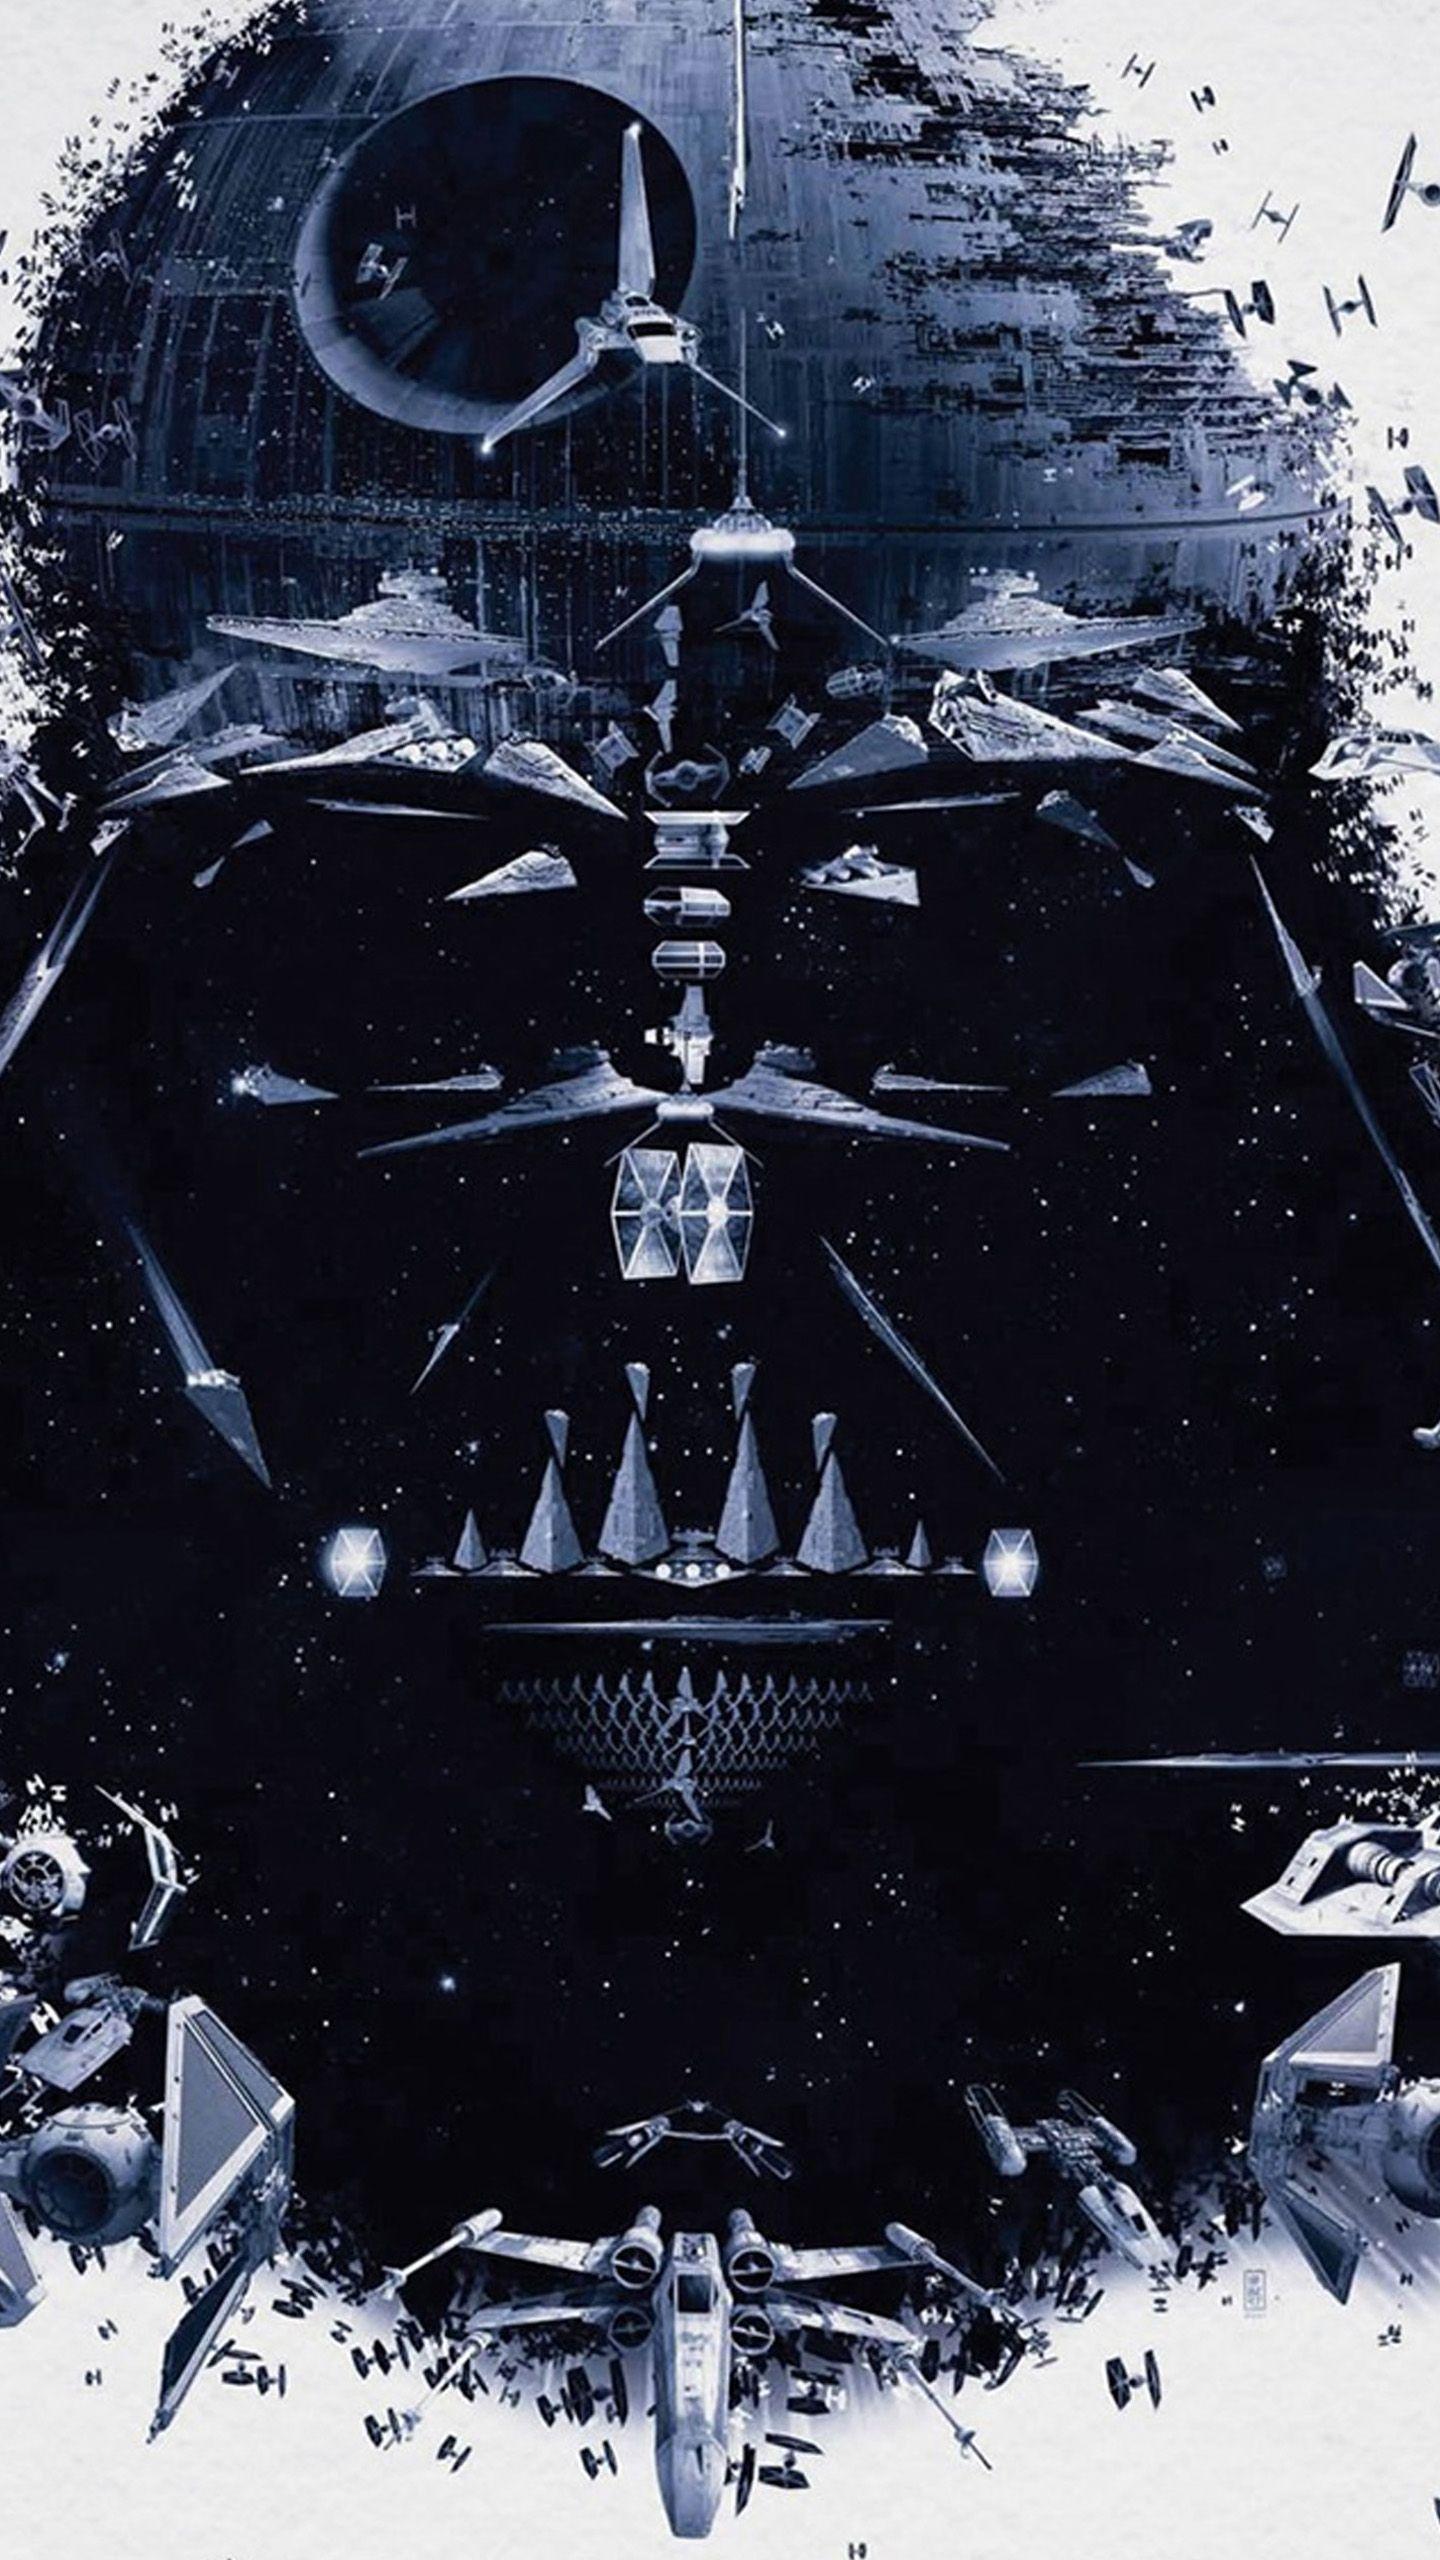 High Resolution Darth Vader Wallpaper Phone Wallpaper Album Wallpapers Album